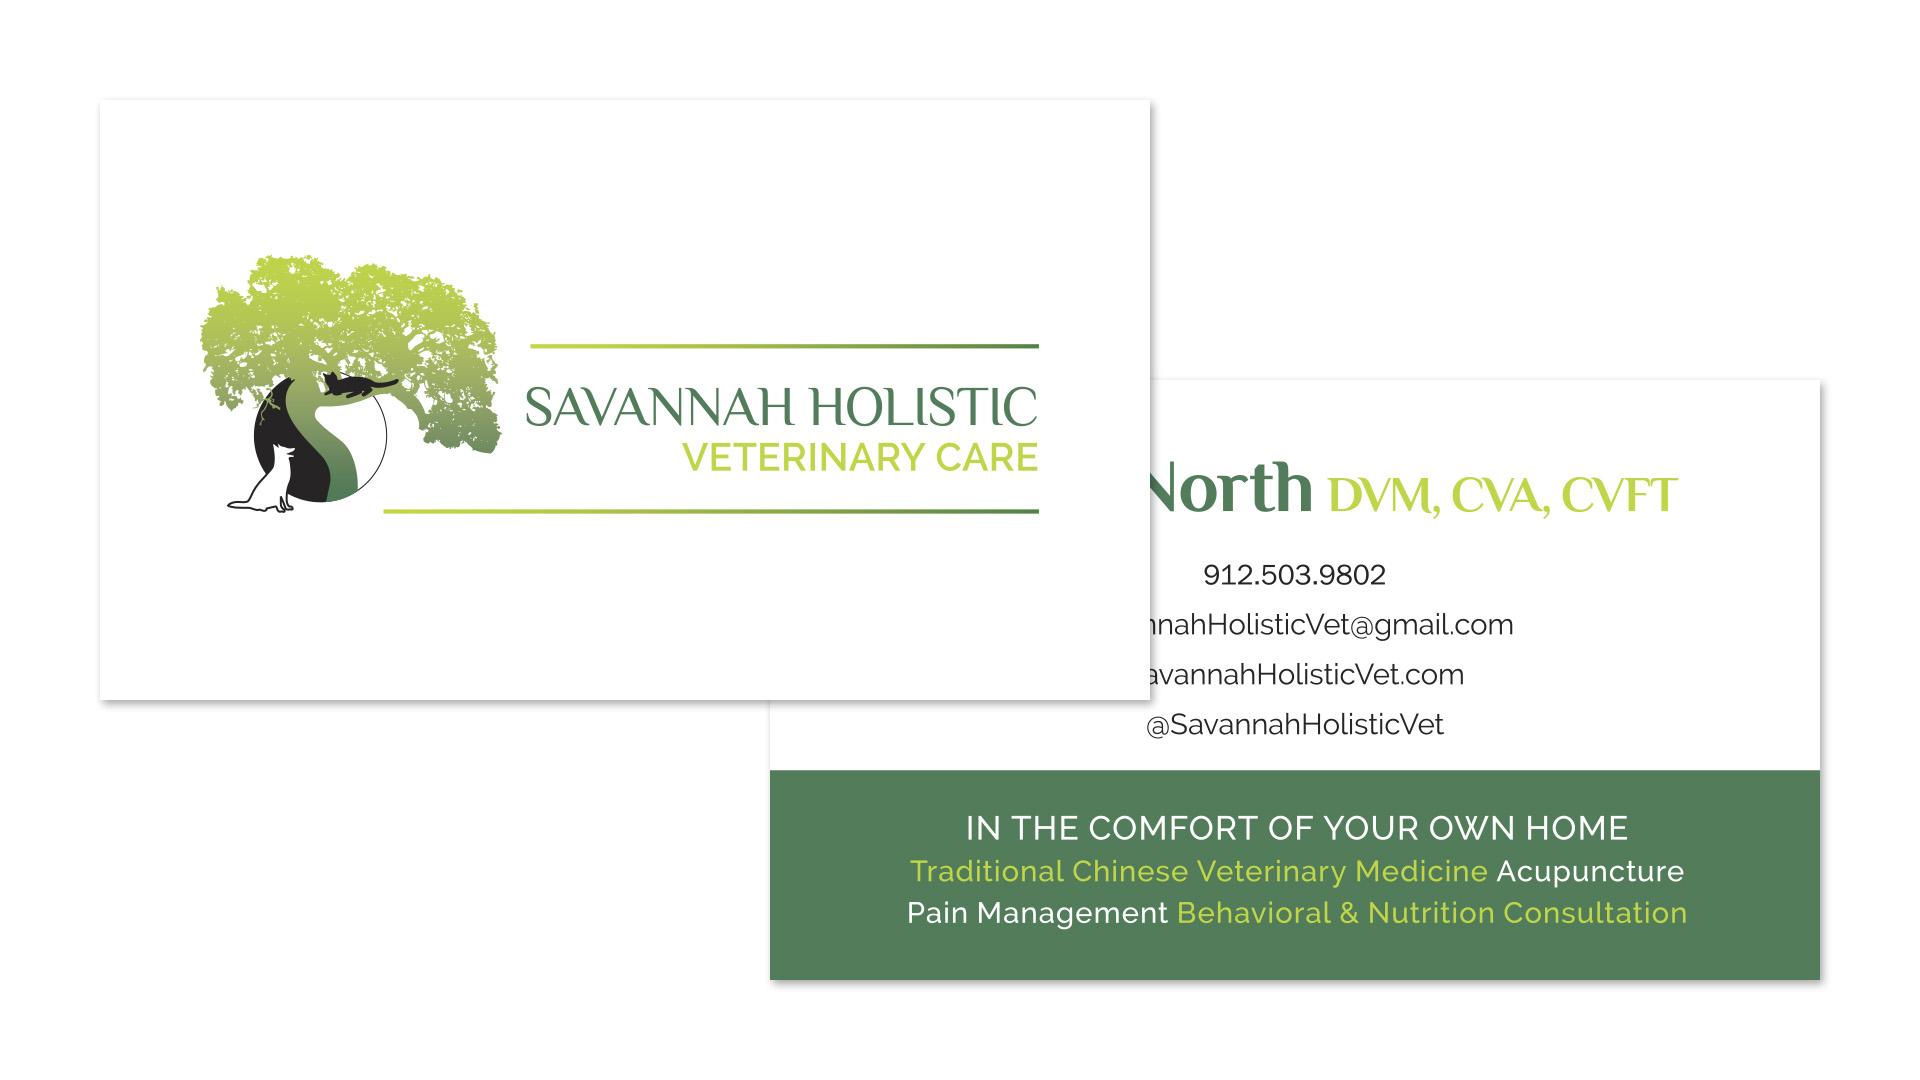 Savannah Holistic Veterinary Care Business Card - Graphic Design - Speros